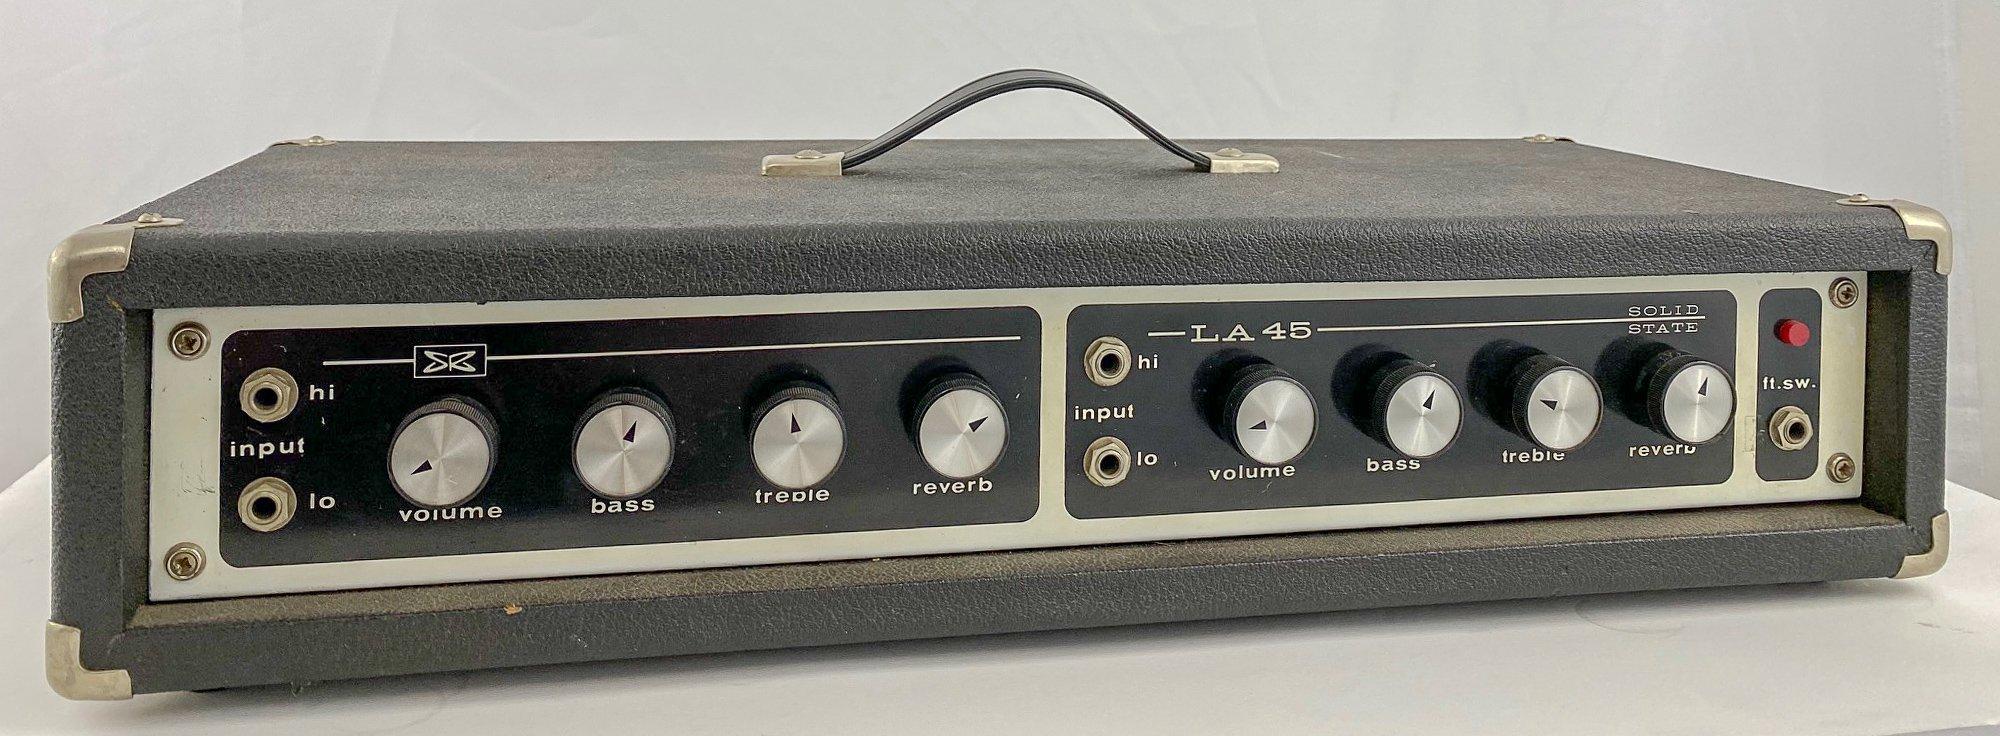 Vintage Sears LA-45 guitar amp head